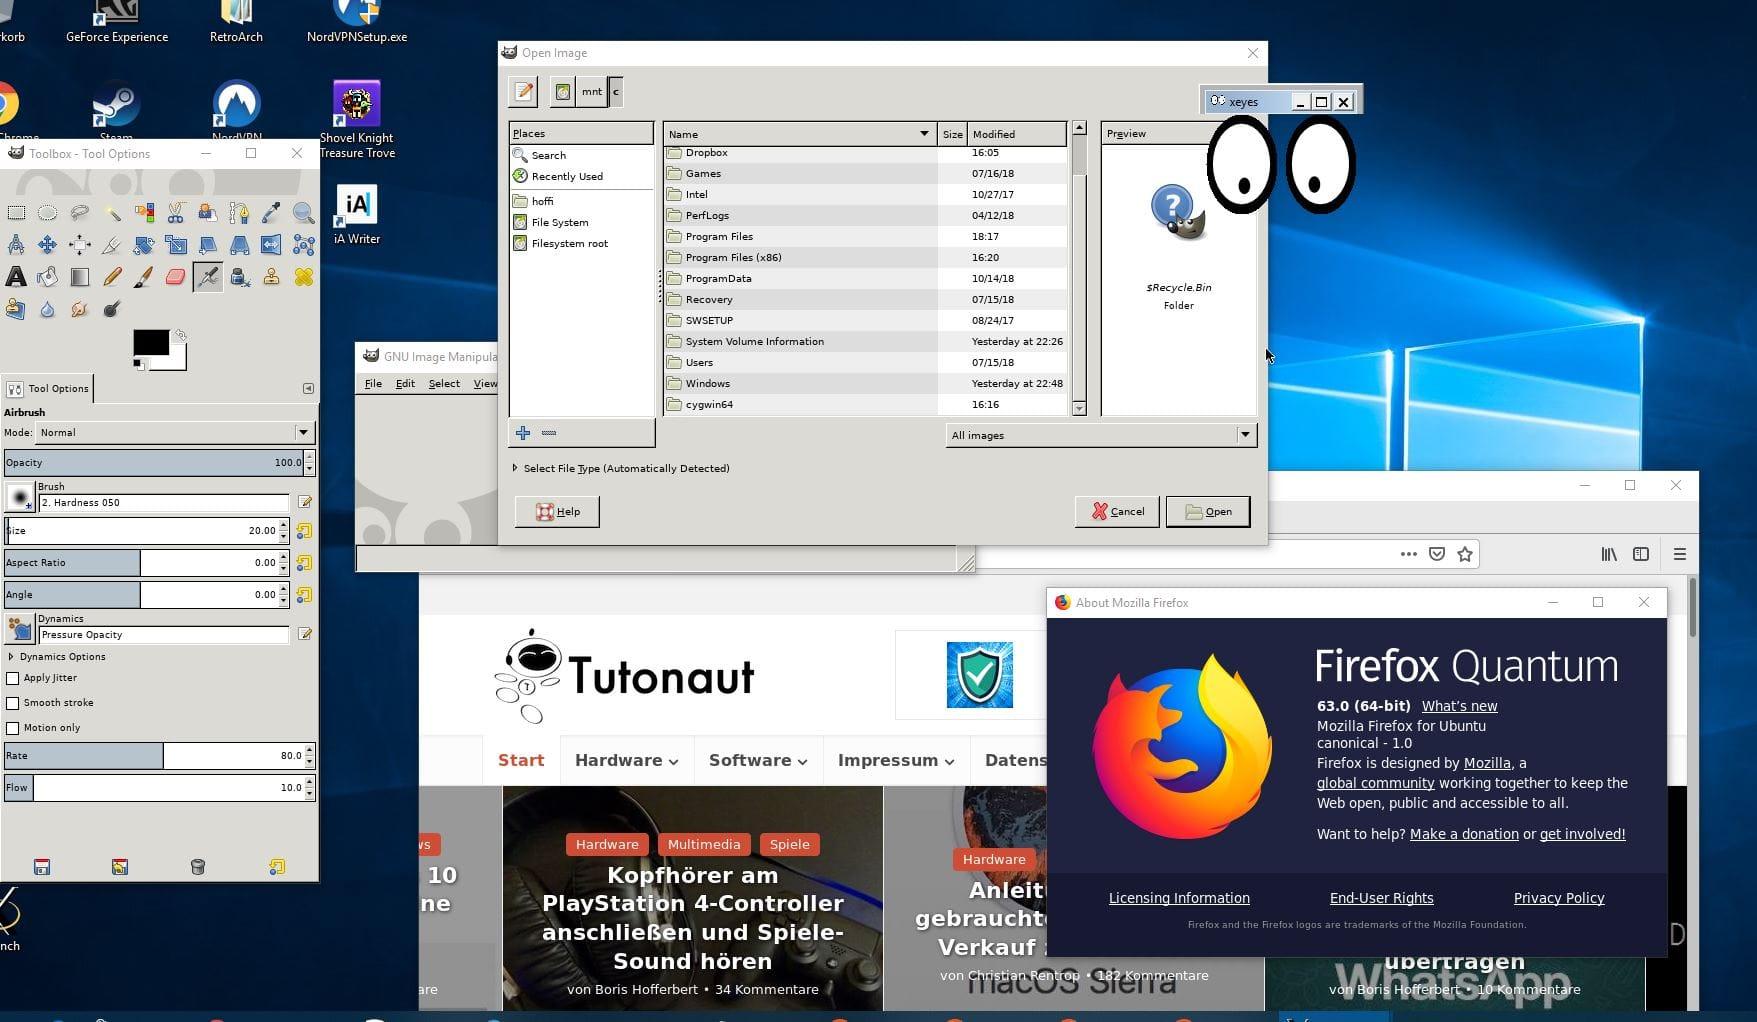 Linux-Apps unter Windows 10